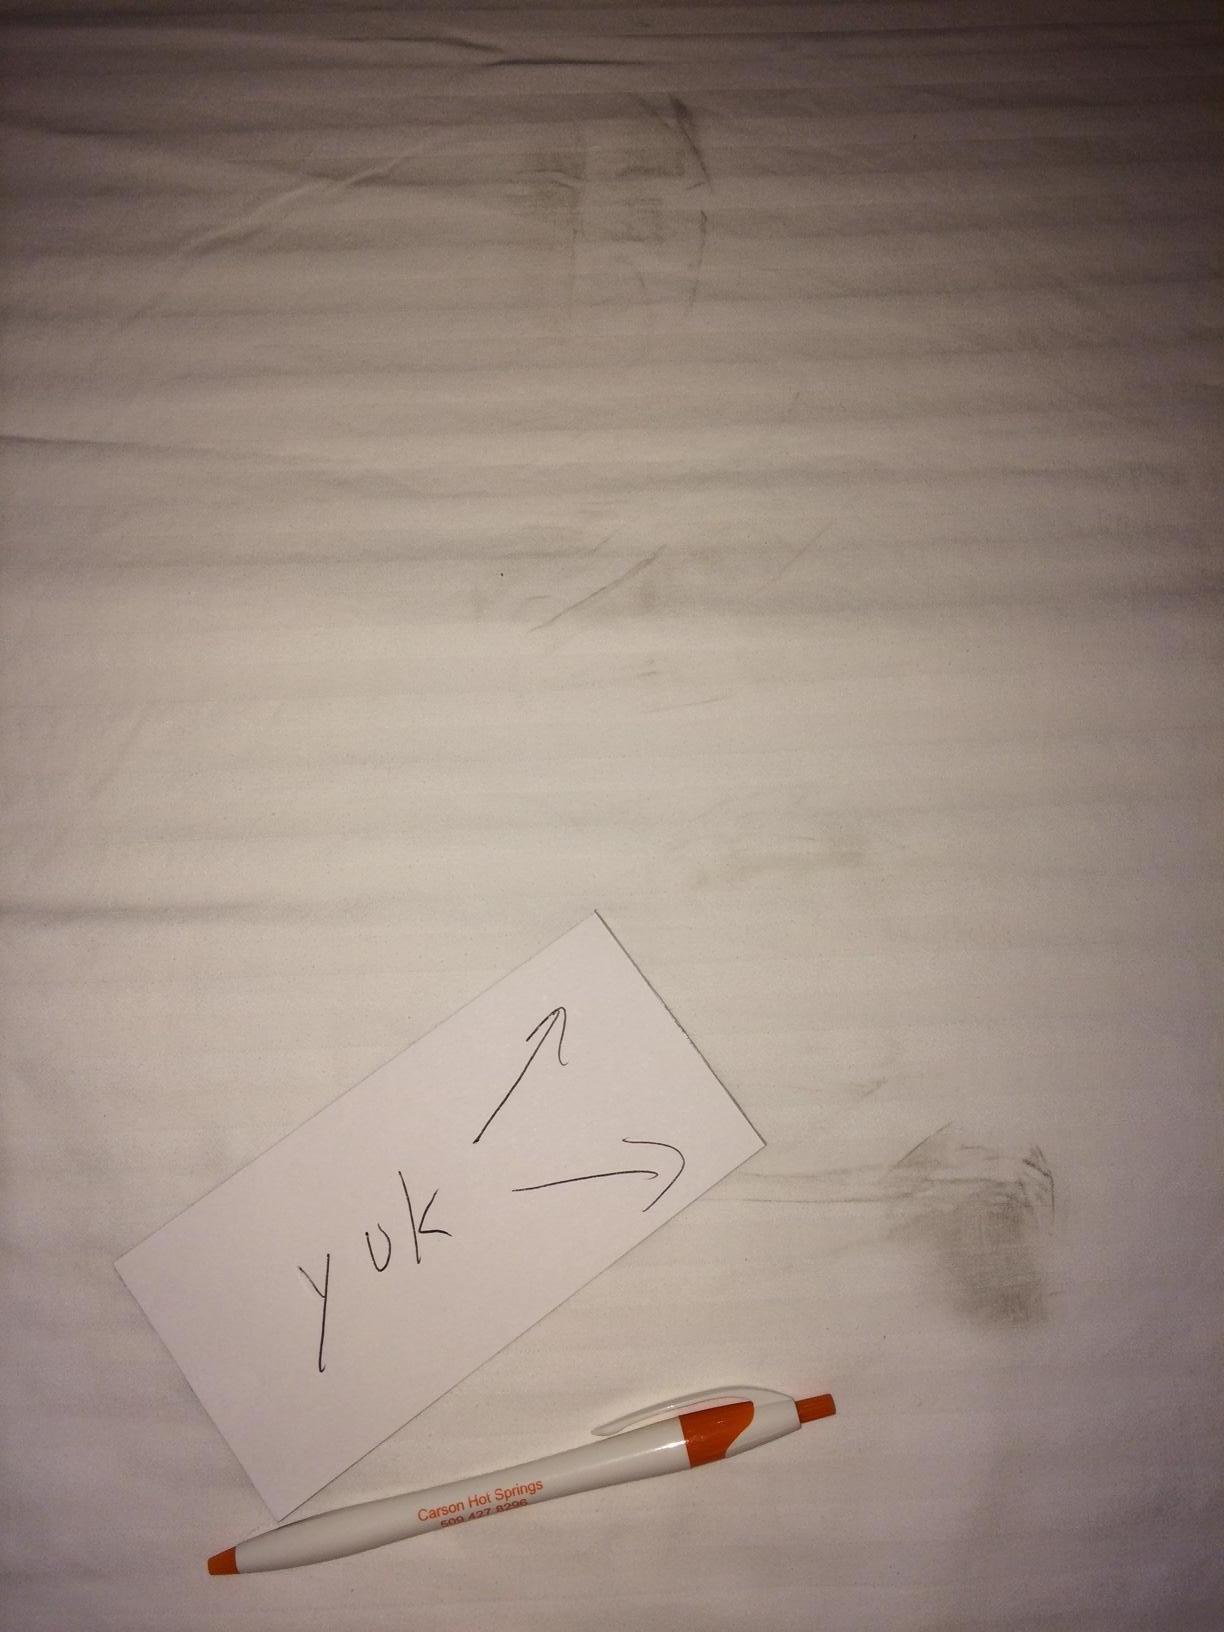 Boot prints on sheet